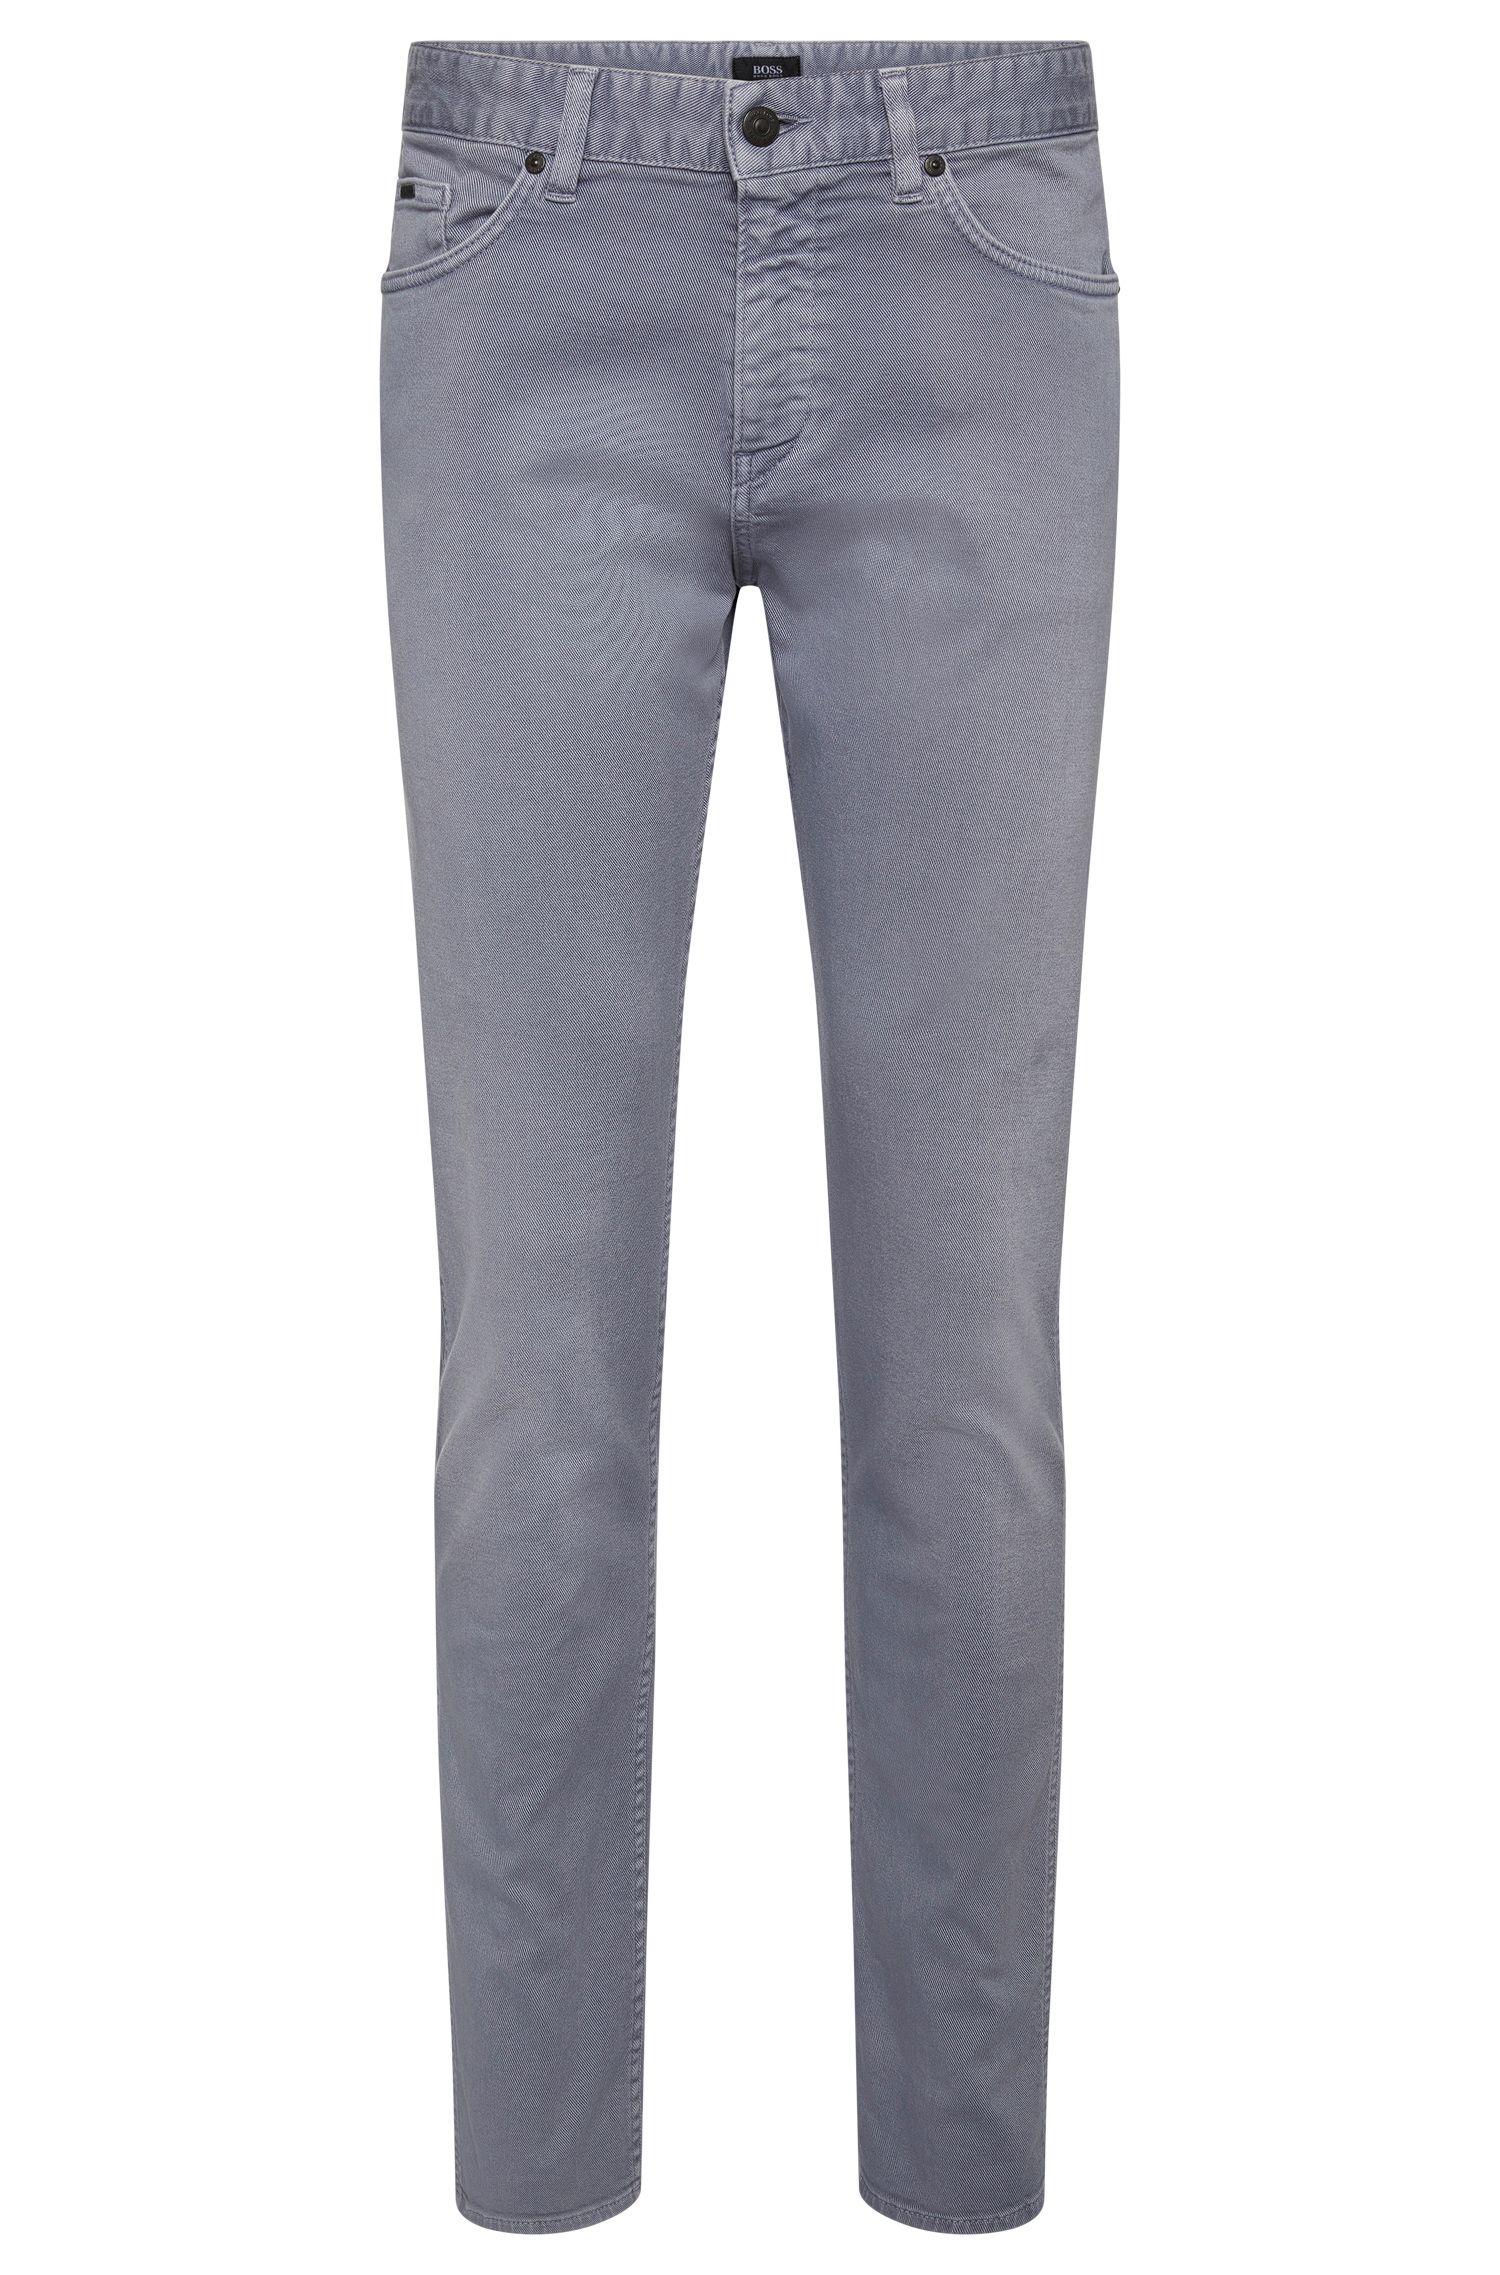 'Delaware' | Slim Fit, 8.5 oz Stretch Cotton Blend Jeans